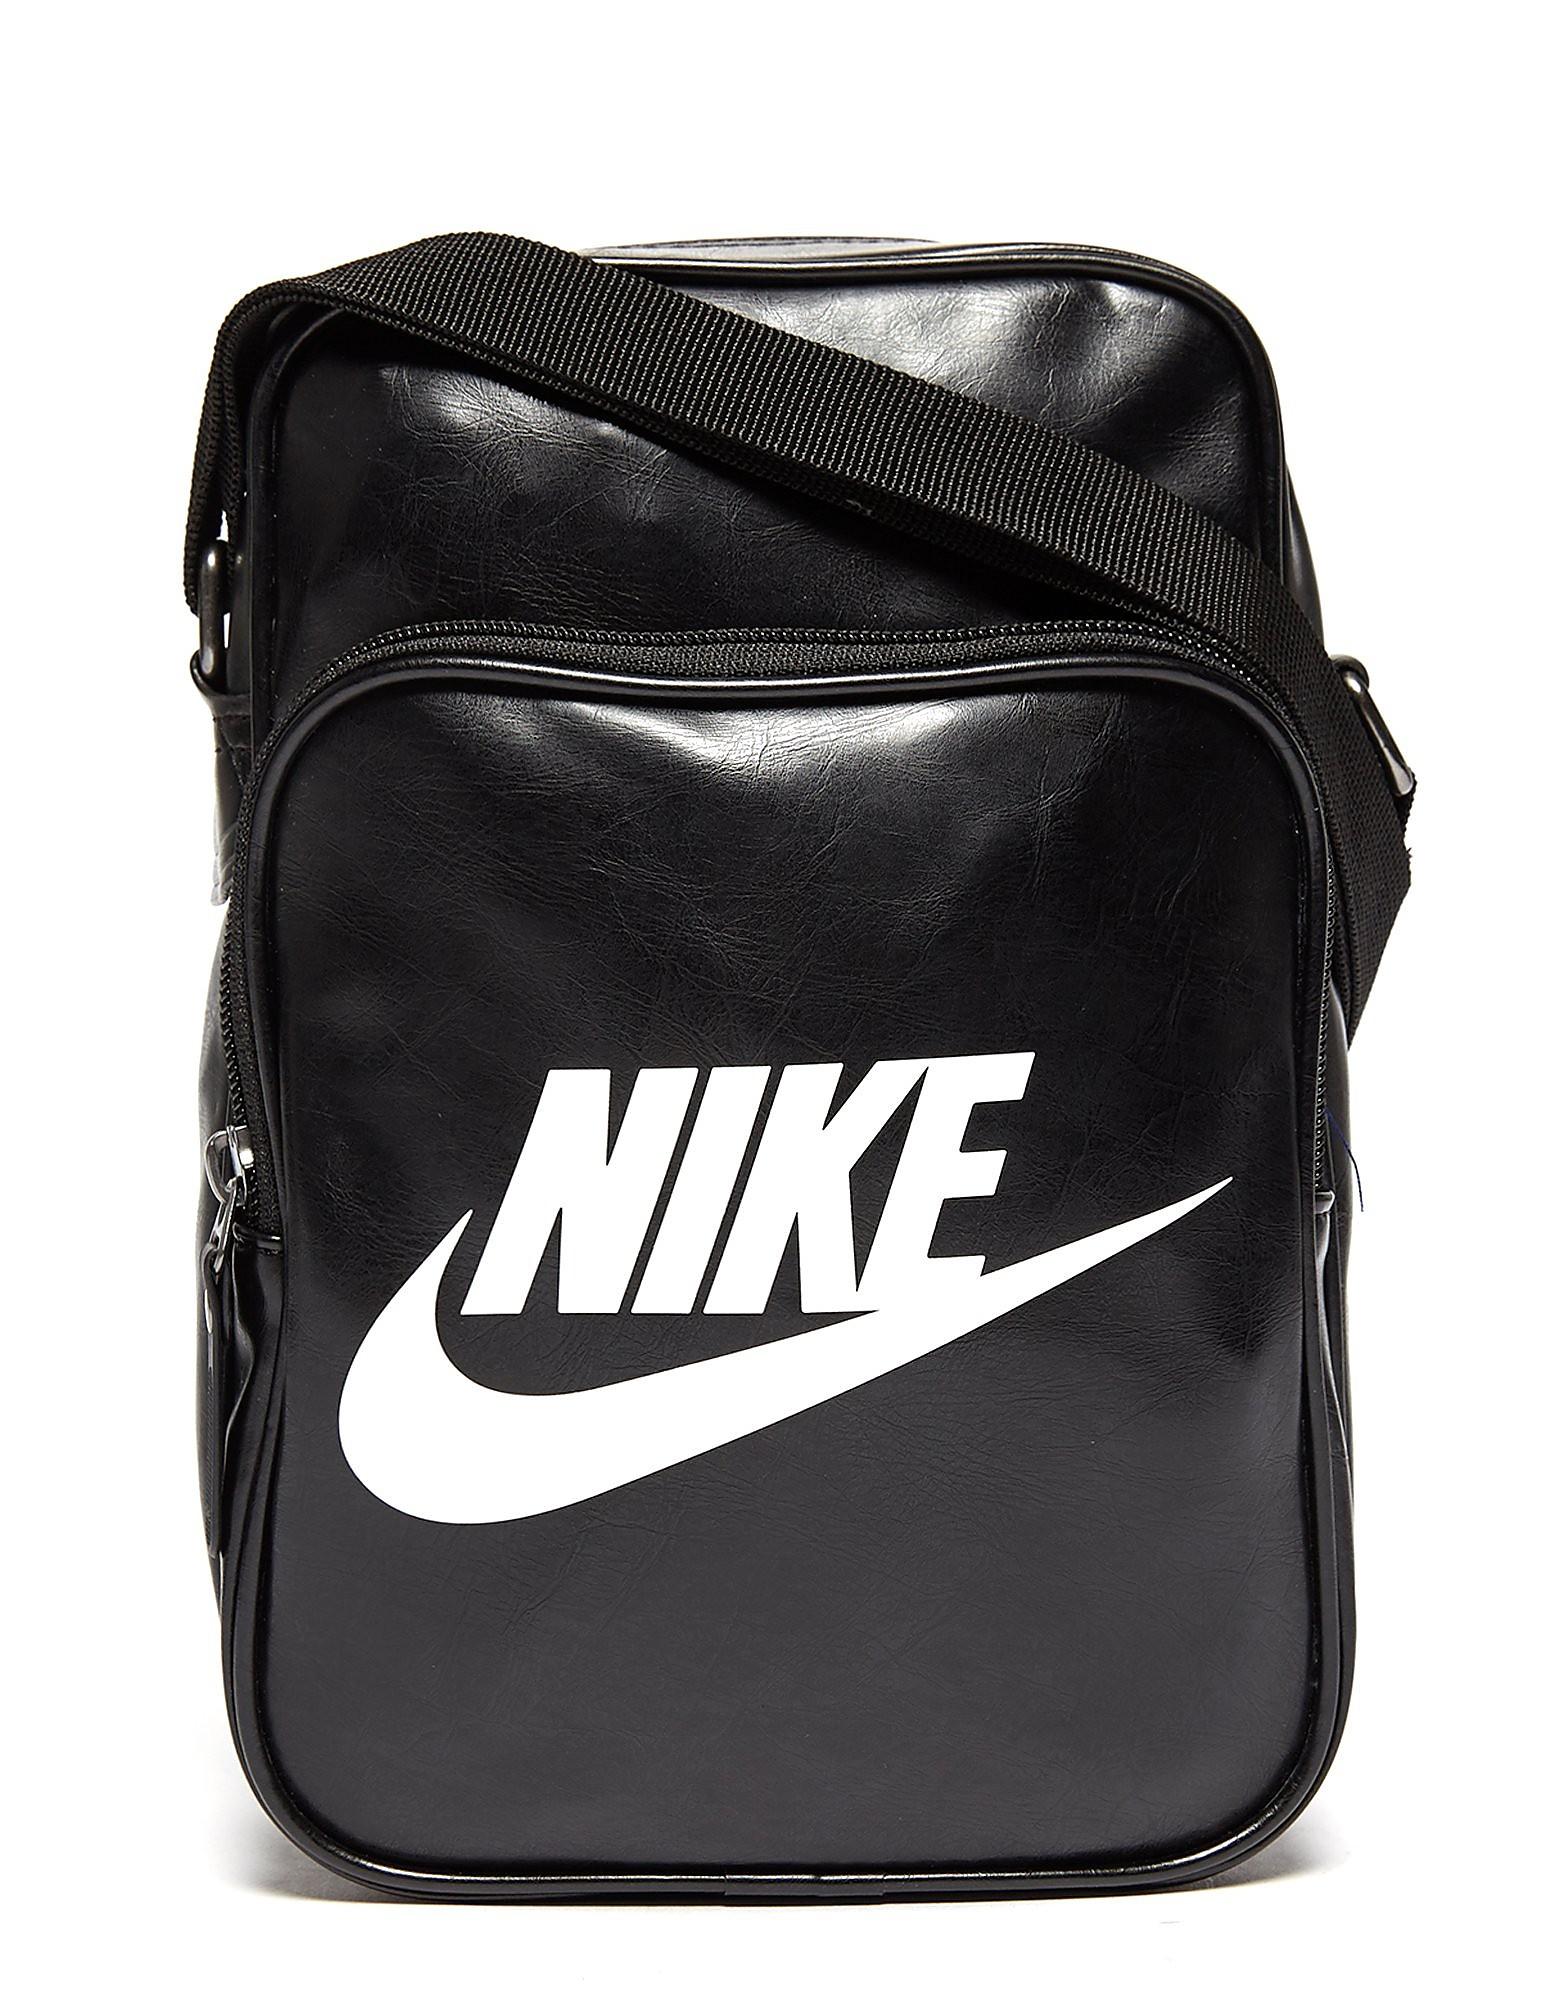 Nike Heritage Small Items Bag - Black/Sail - Mens, Black/Sail